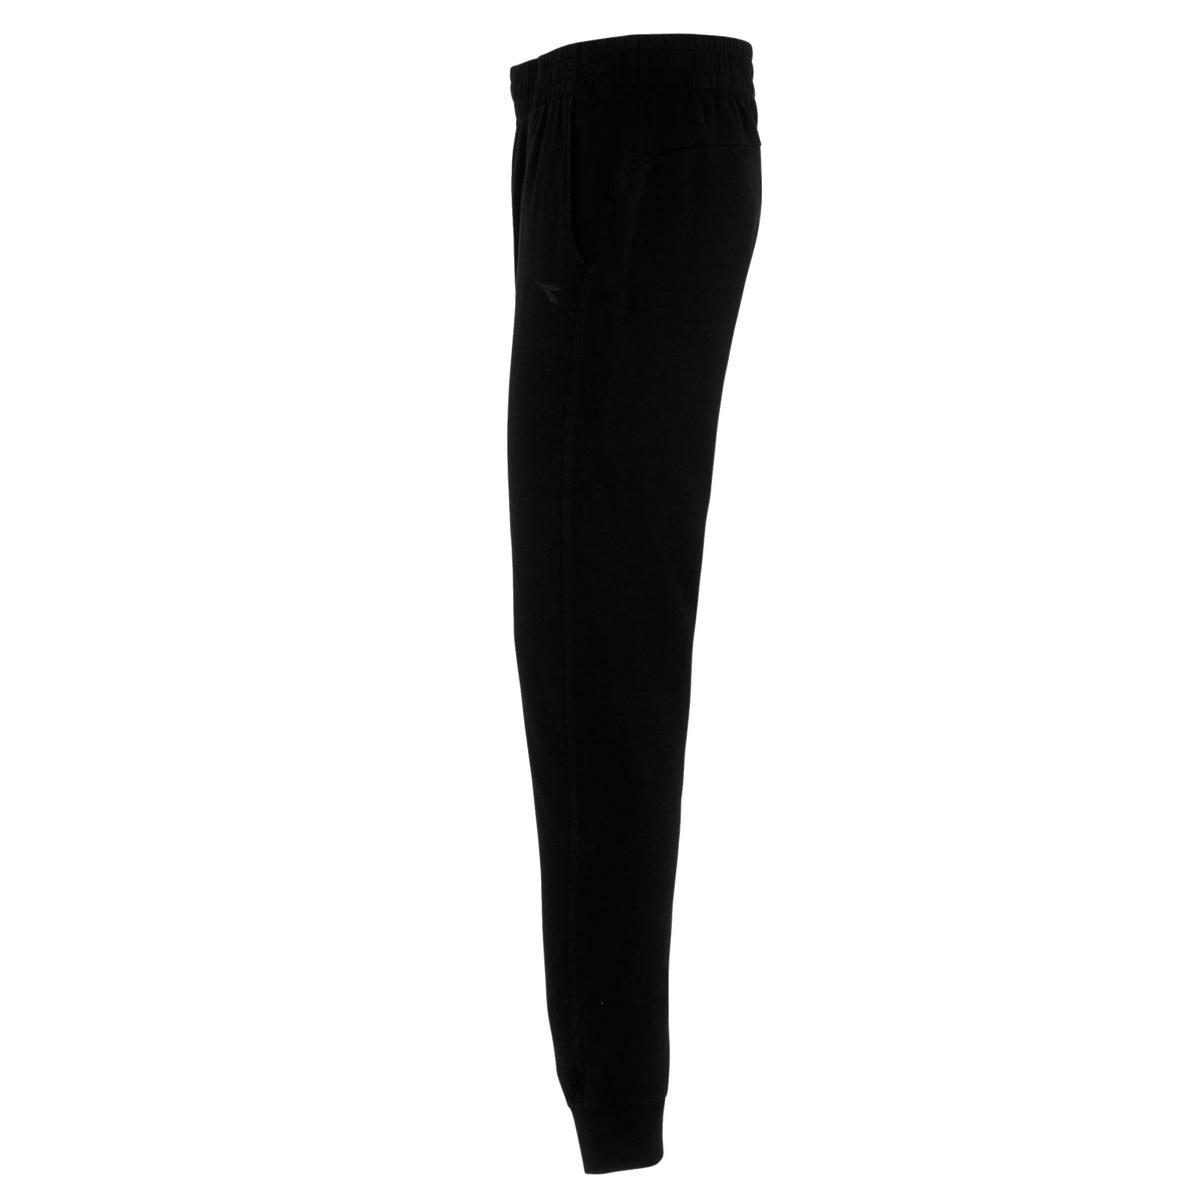 Pantalone tuta Diadora CUFF PANTS da uomo rif. 102.171678